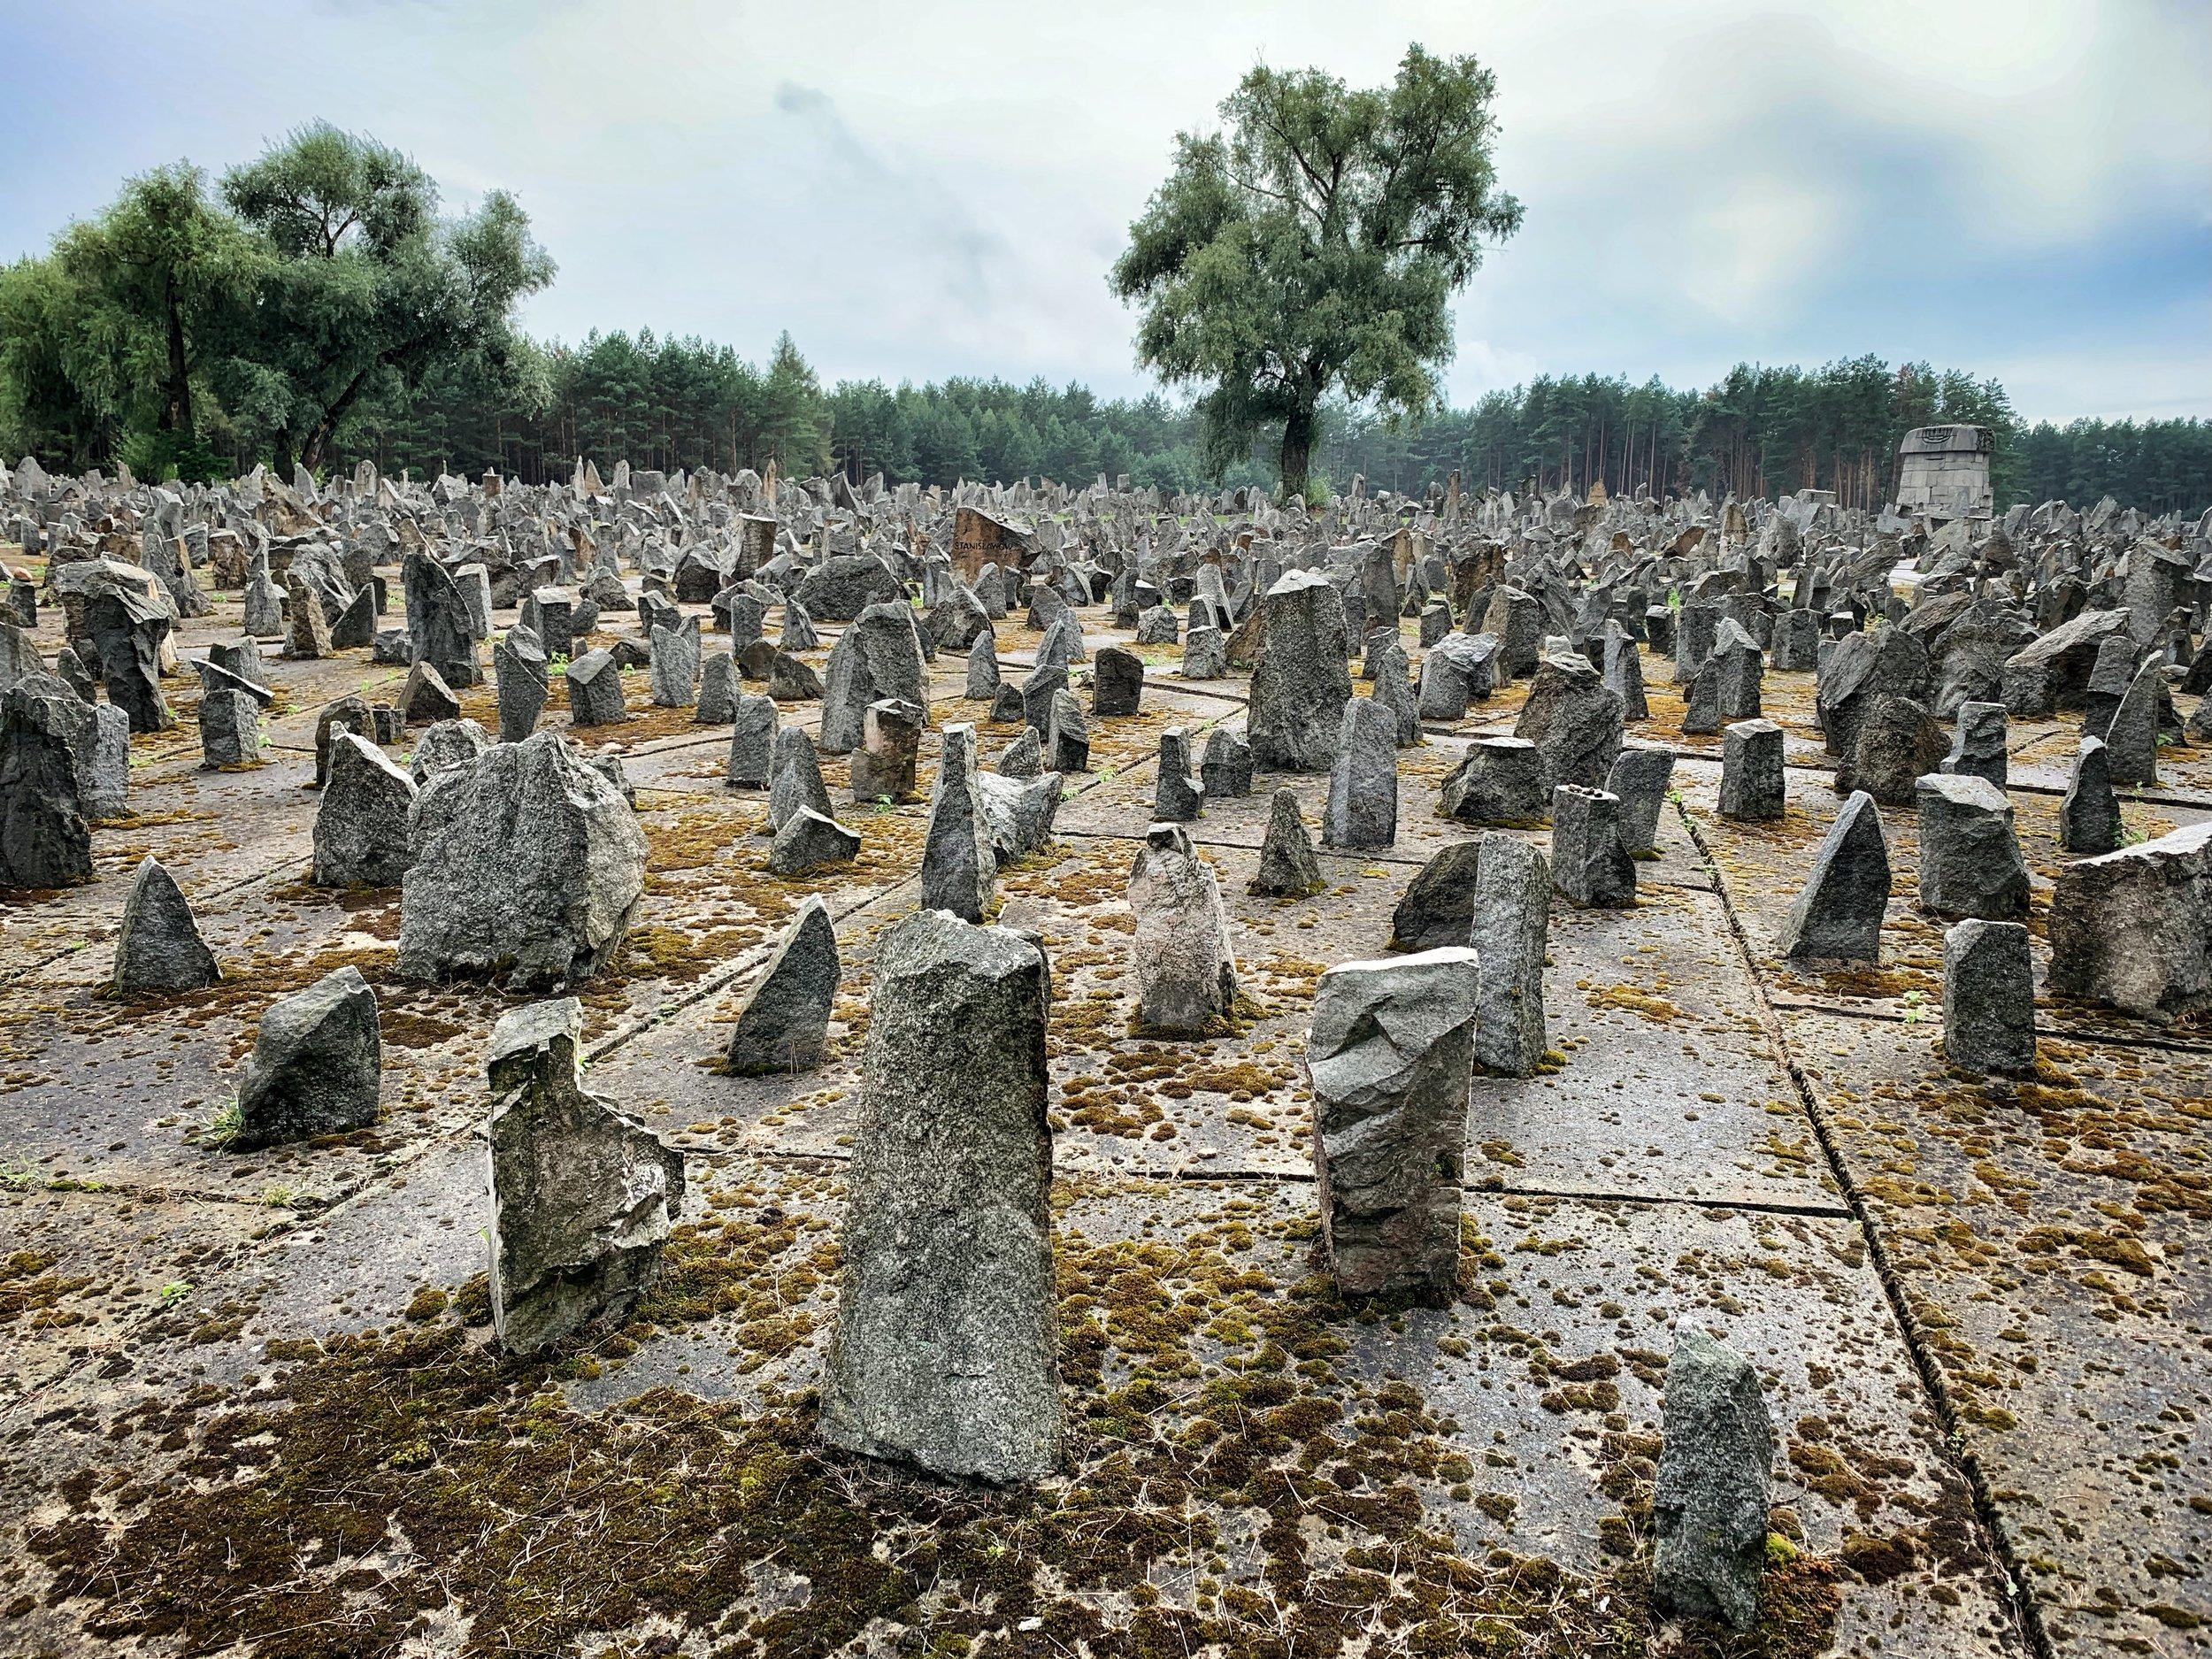 Jagged stone memorial markers represent burial pits — Treblinka